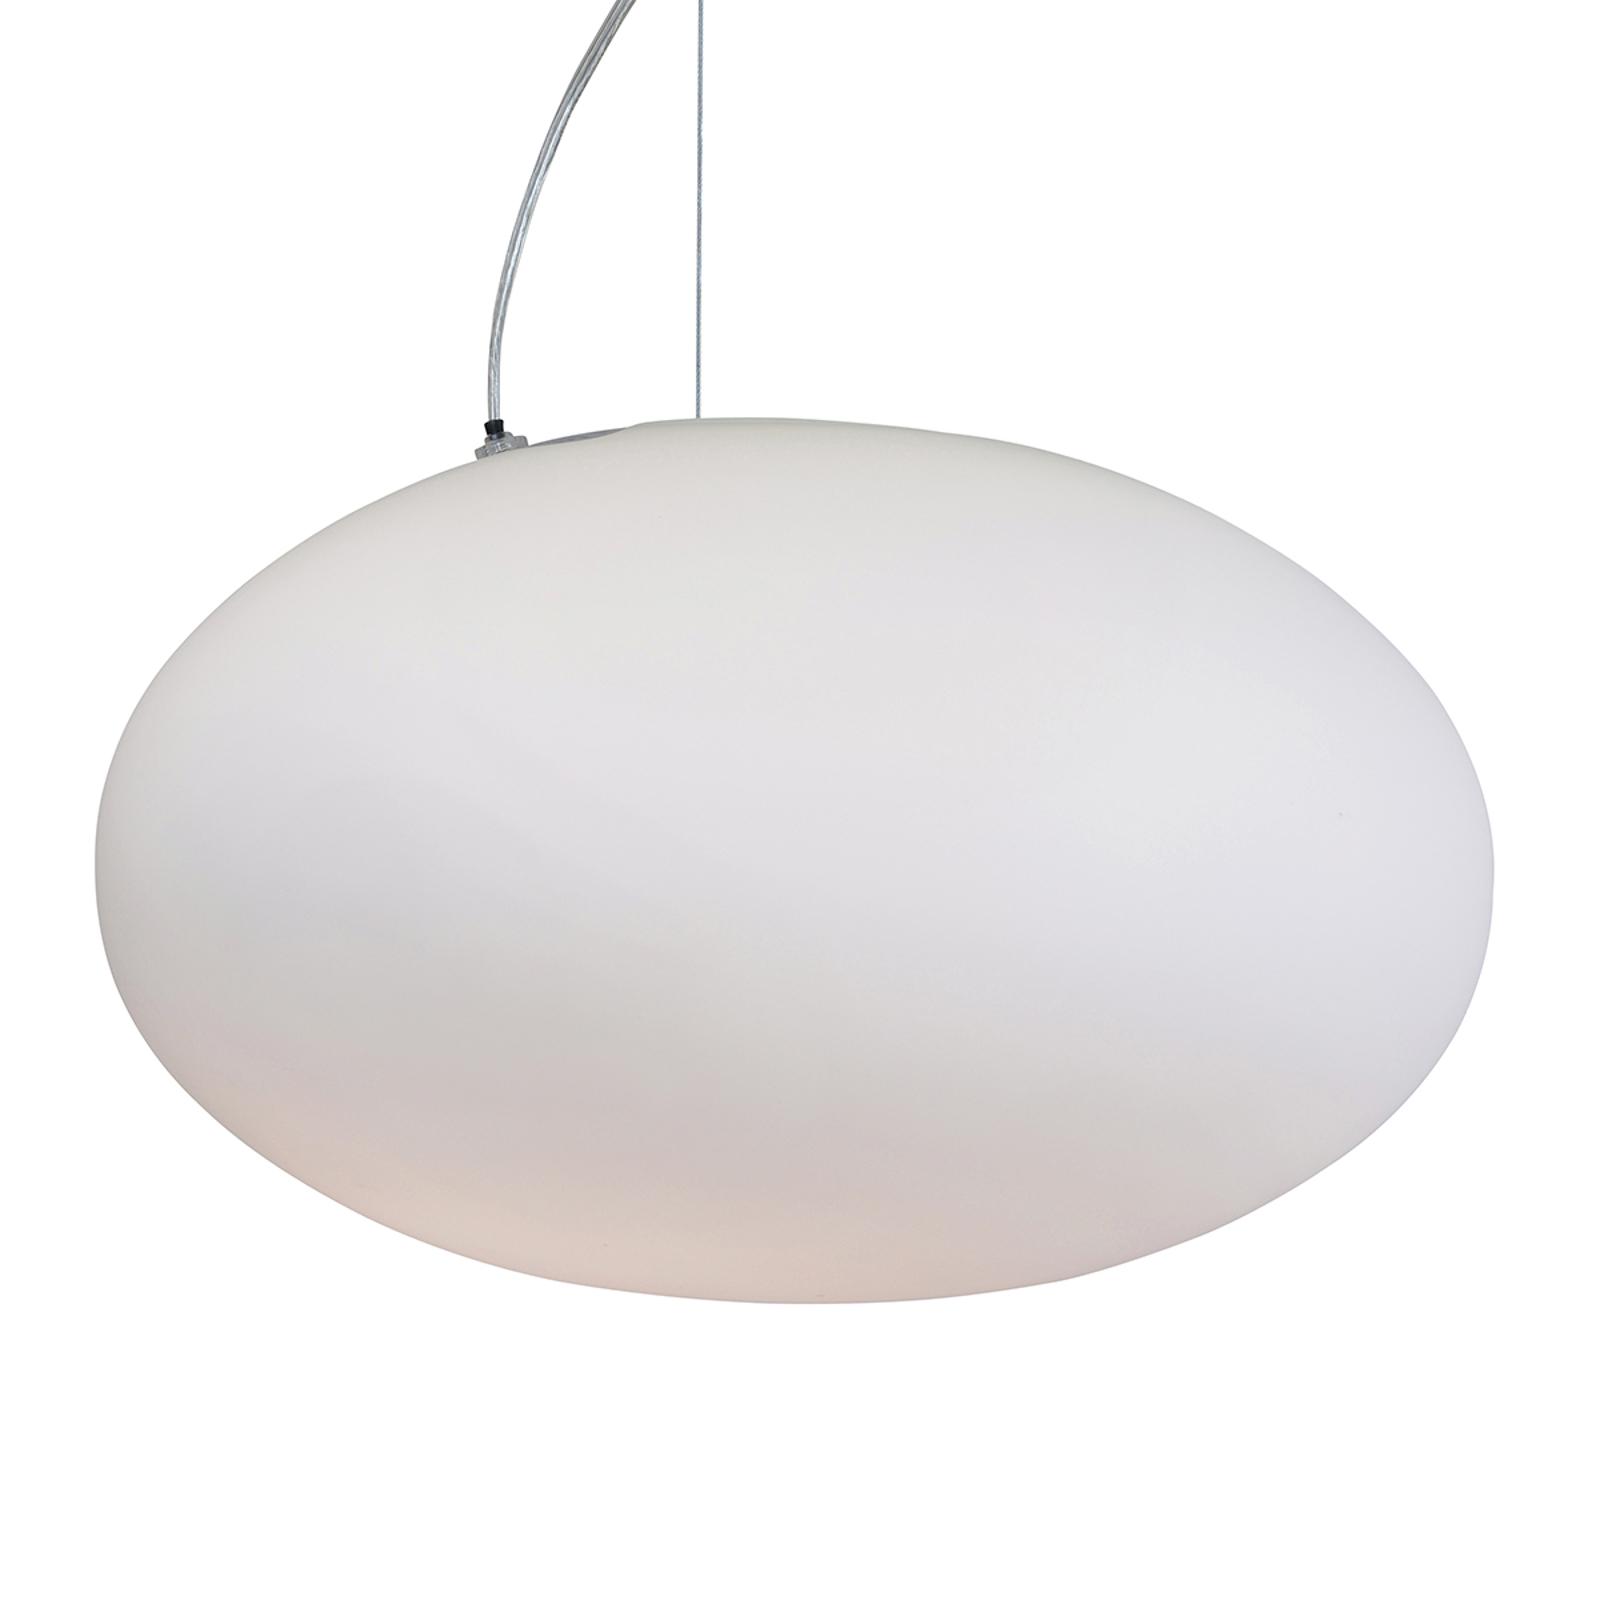 Villeroy & Boch Vancouver glazen hanglamp 40cm